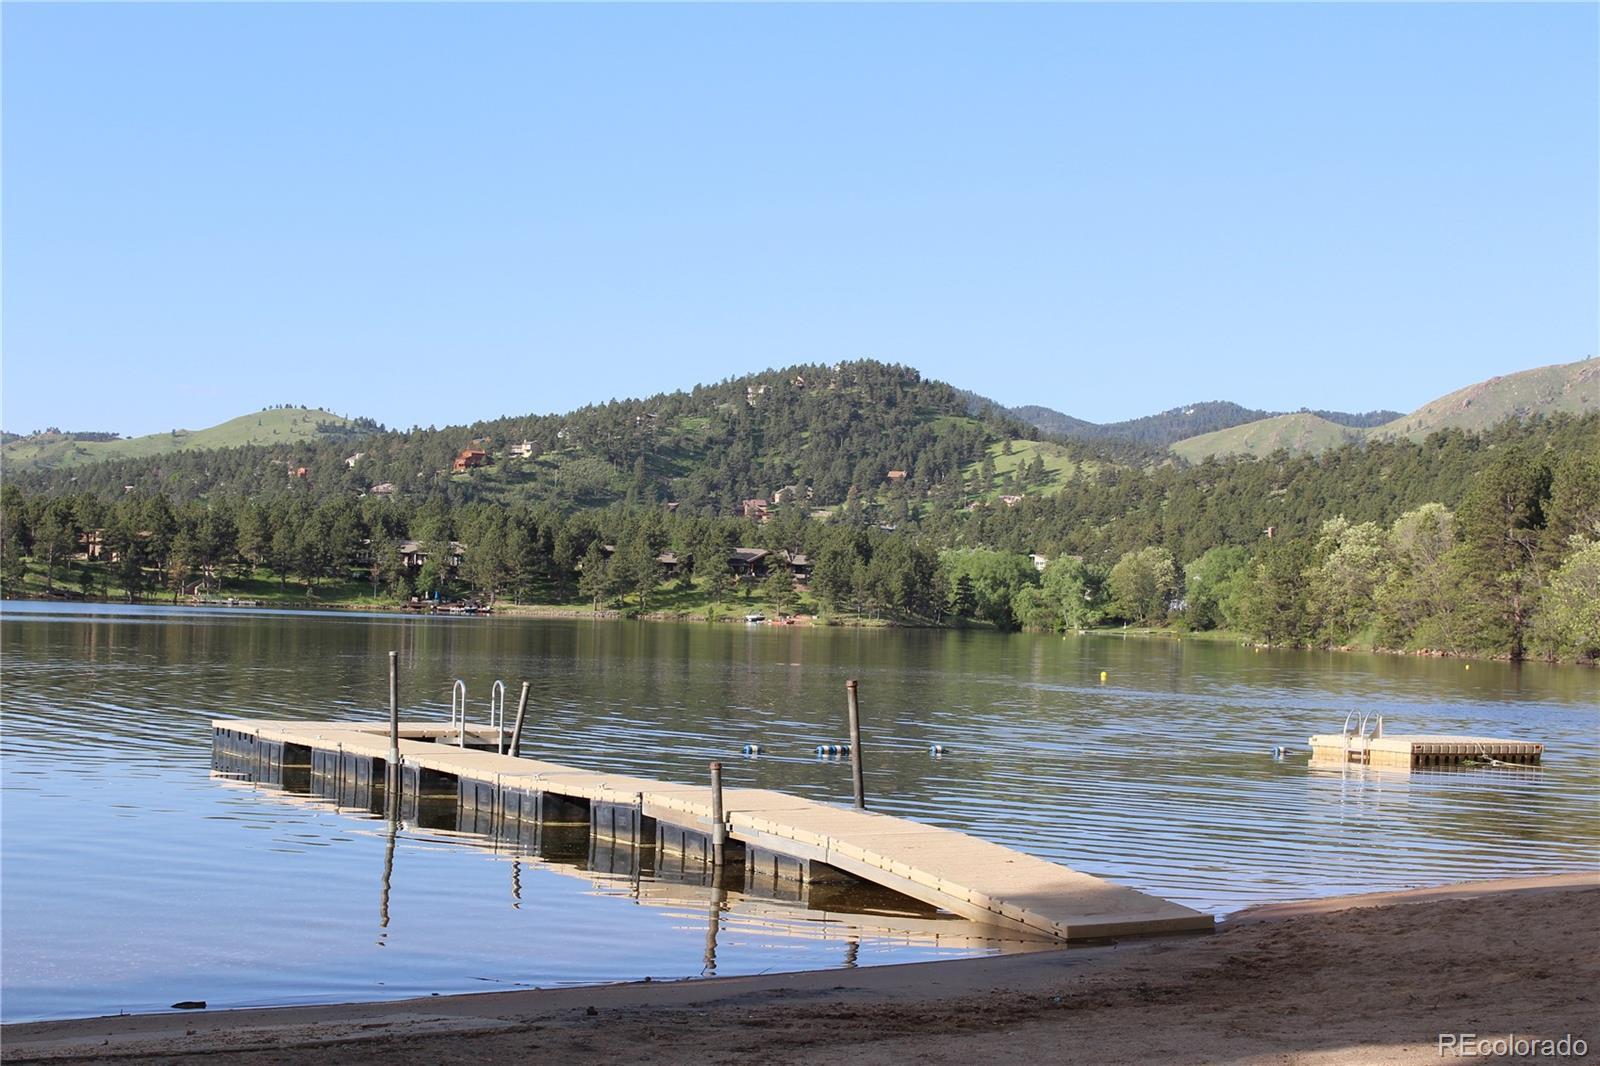 2808 S Lakeridge Trail photo